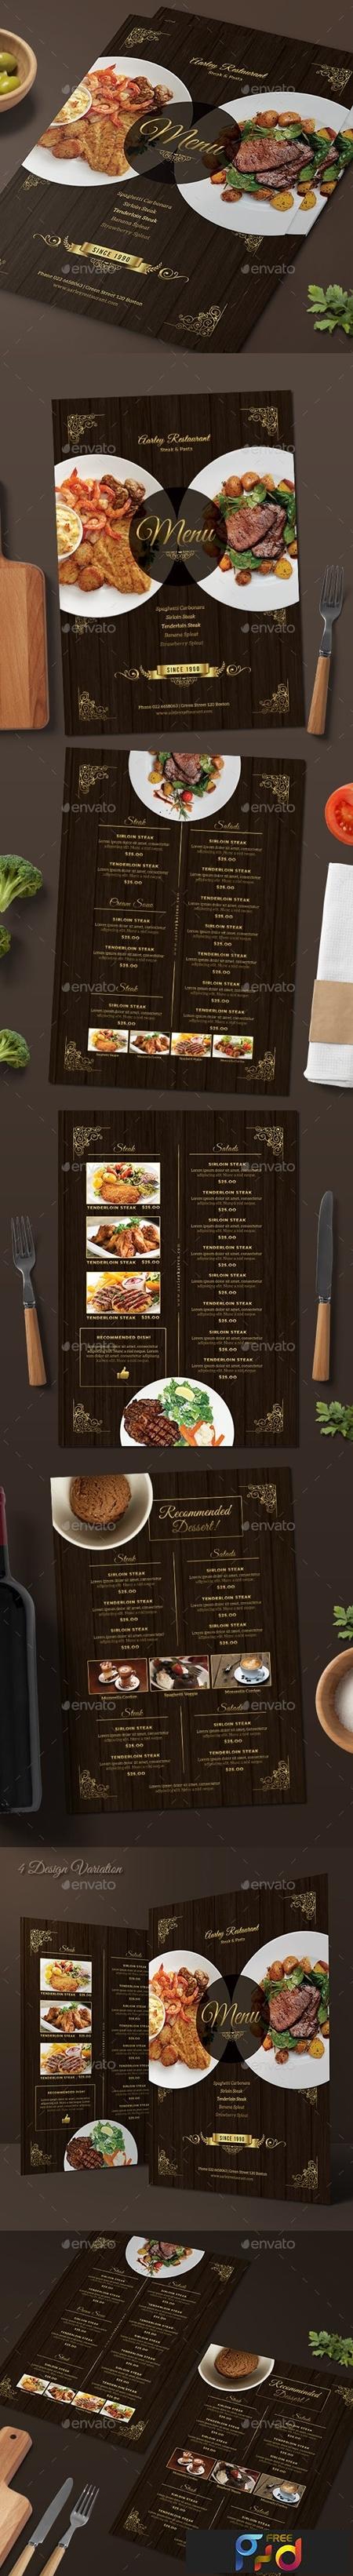 Elegant Restaurant Menu 18590107 1